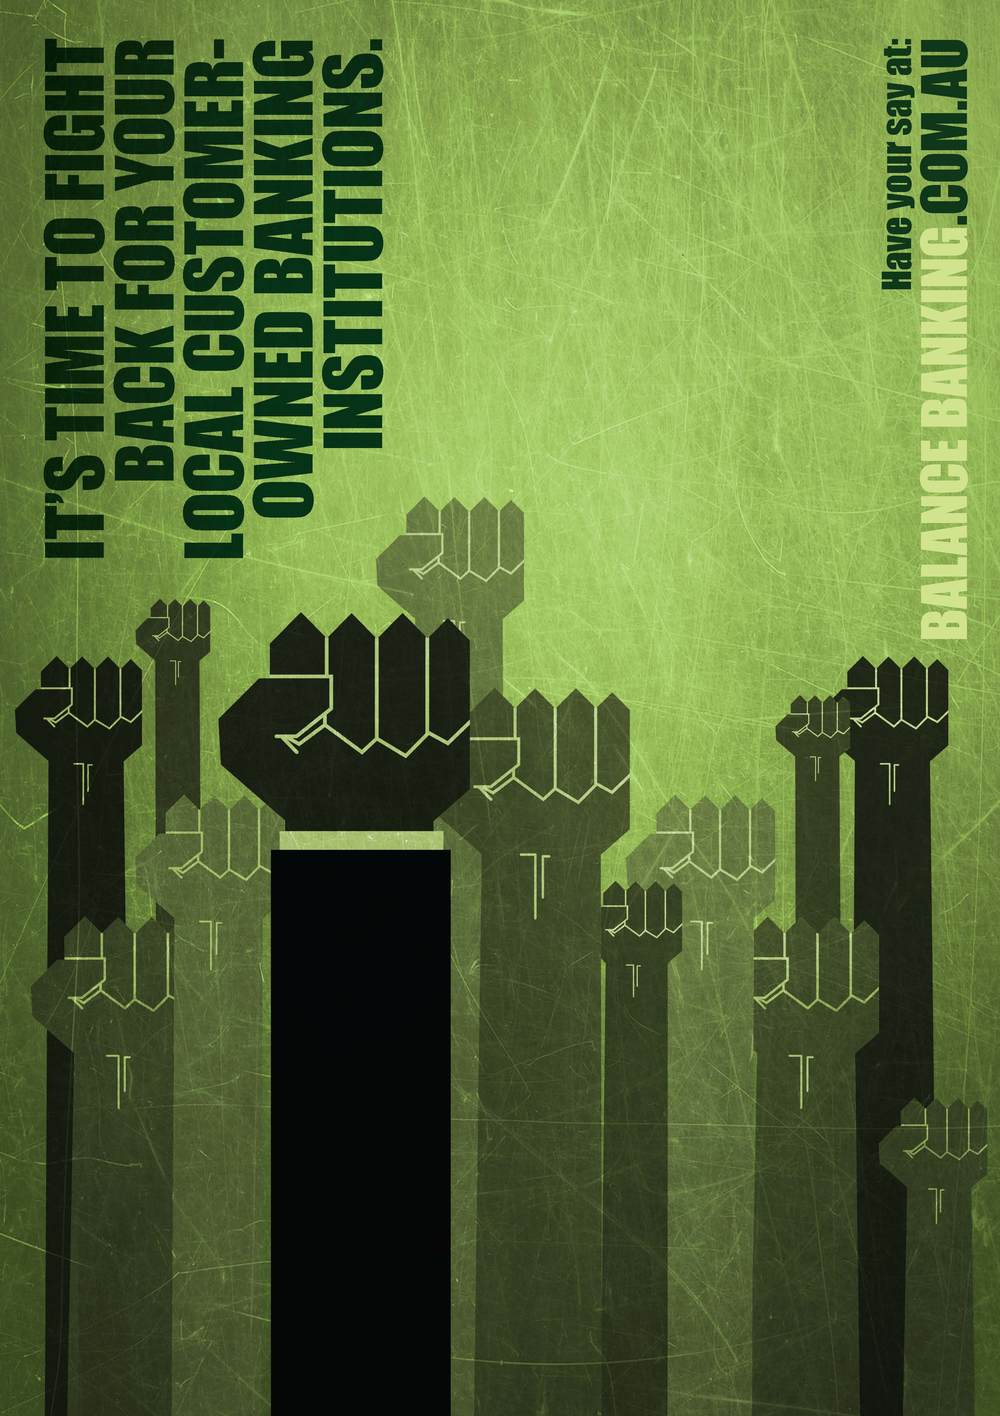 ABACUS0135_A3 Poster_v01_HR.jpg